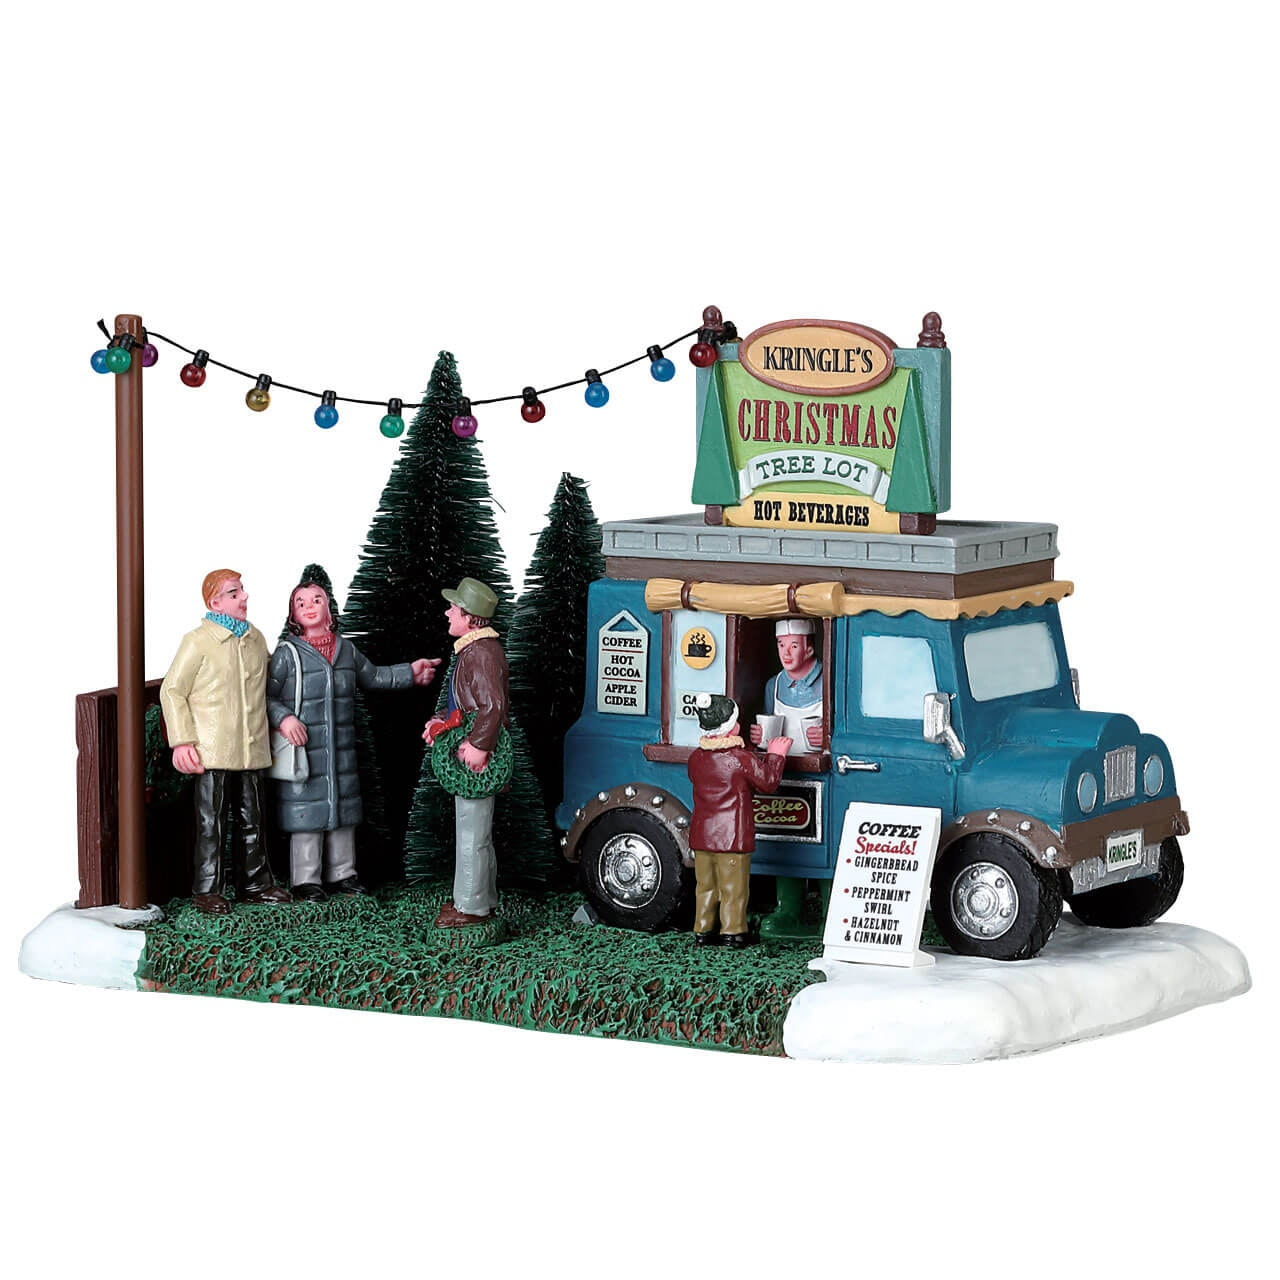 Kringles For Christmas.Kringle S Christmas Tree Lot